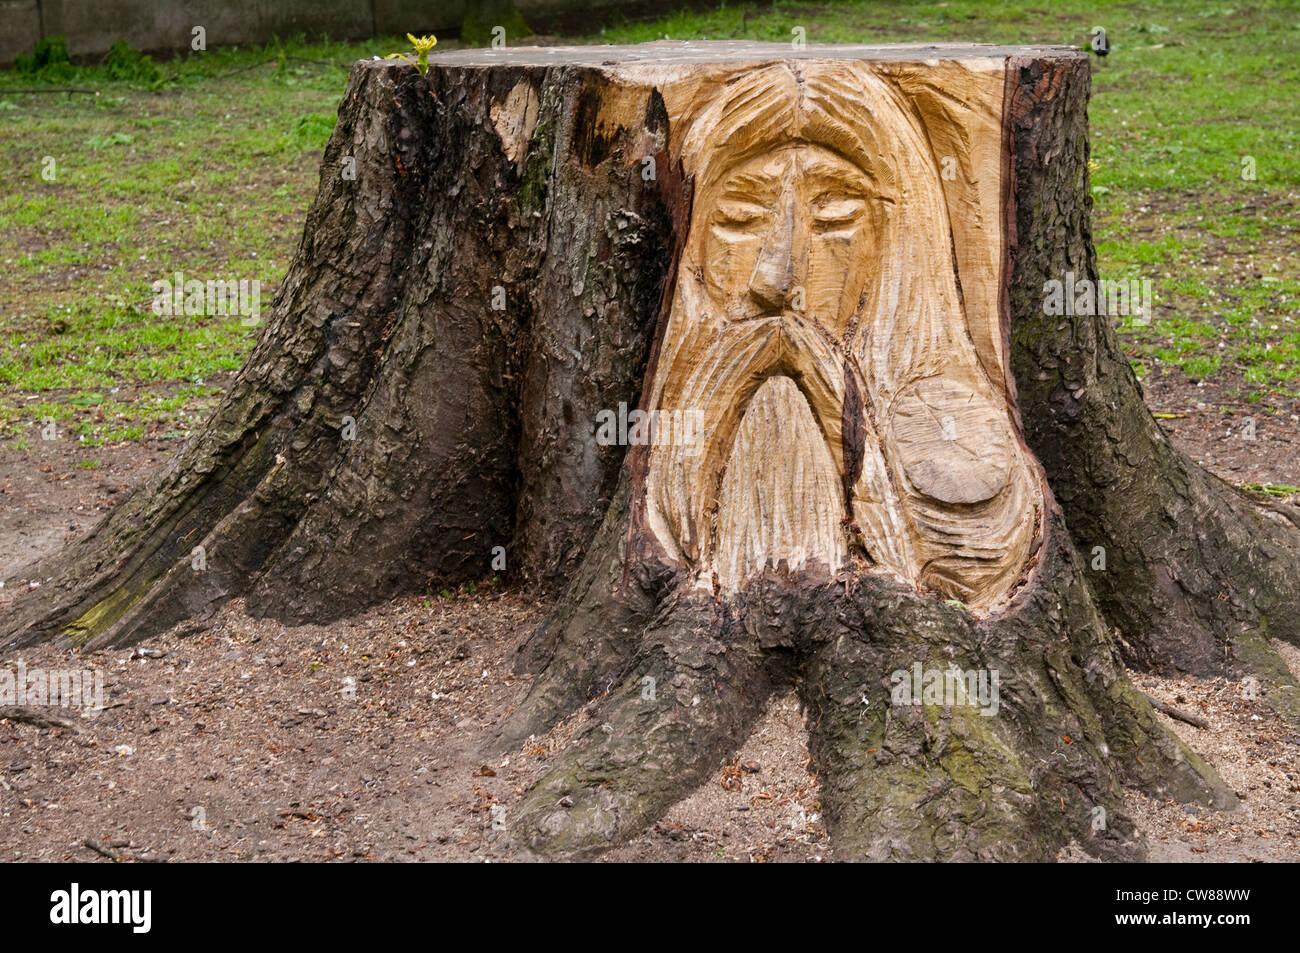 Wood Sculpture by Mark Butler at Vernon Park in Nottingham, Nottinghamshire England UK - Stock Image